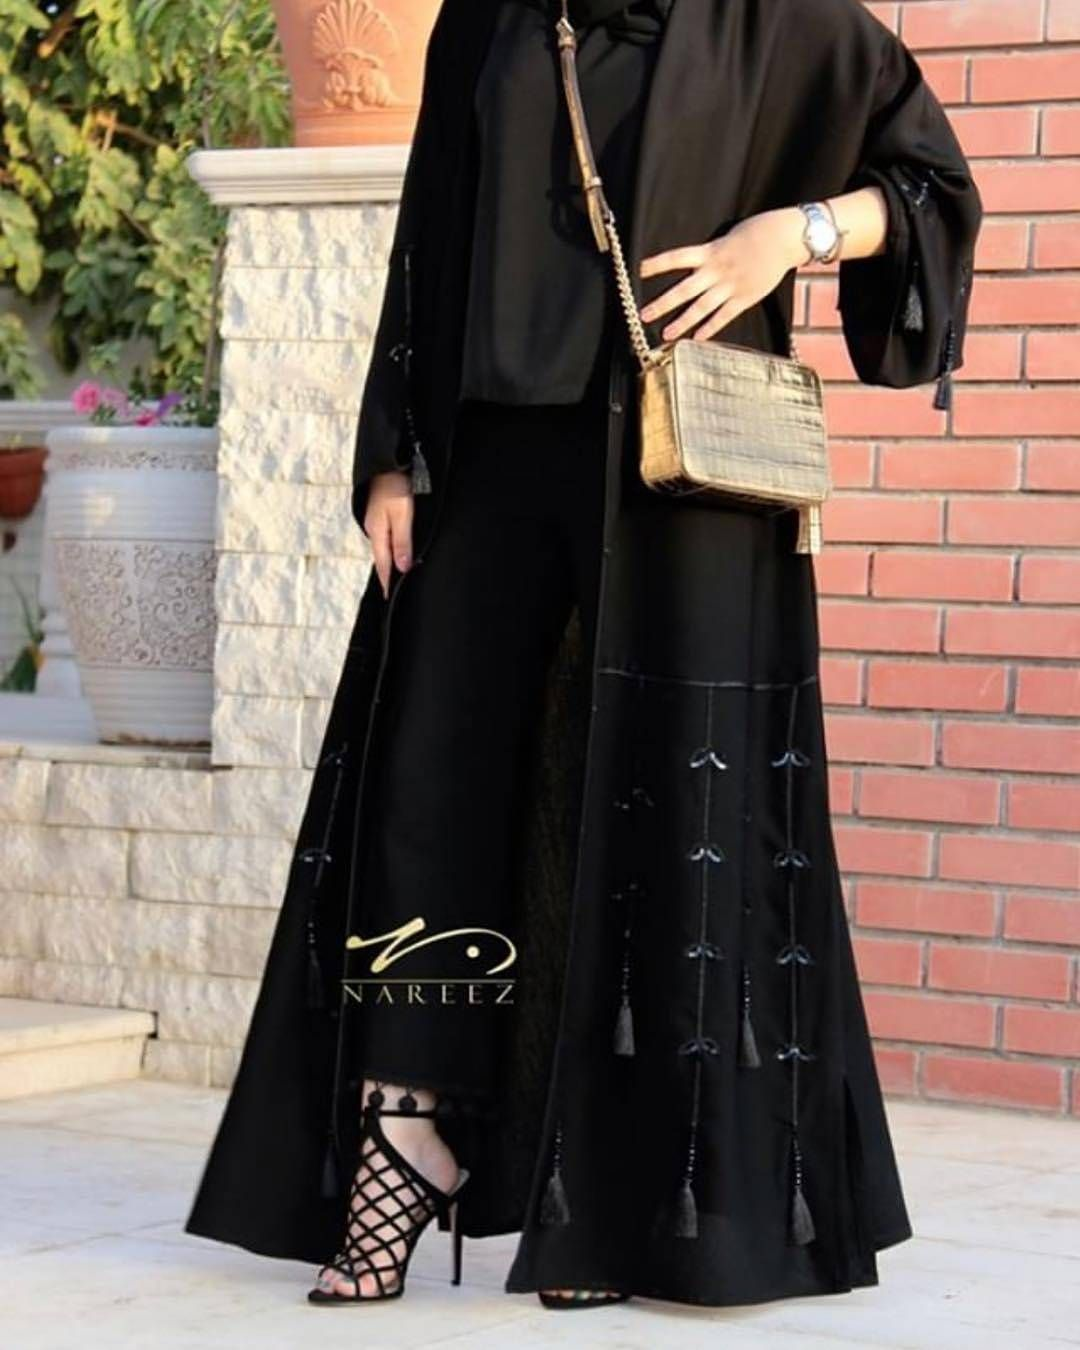 62e27a5e0 #Repost @abaya_designs with @instatoolsapp Abaya from @nareez_boutique # abayas #abaya #abayat #mydubai #dubai #SubhanAbayas #l4l